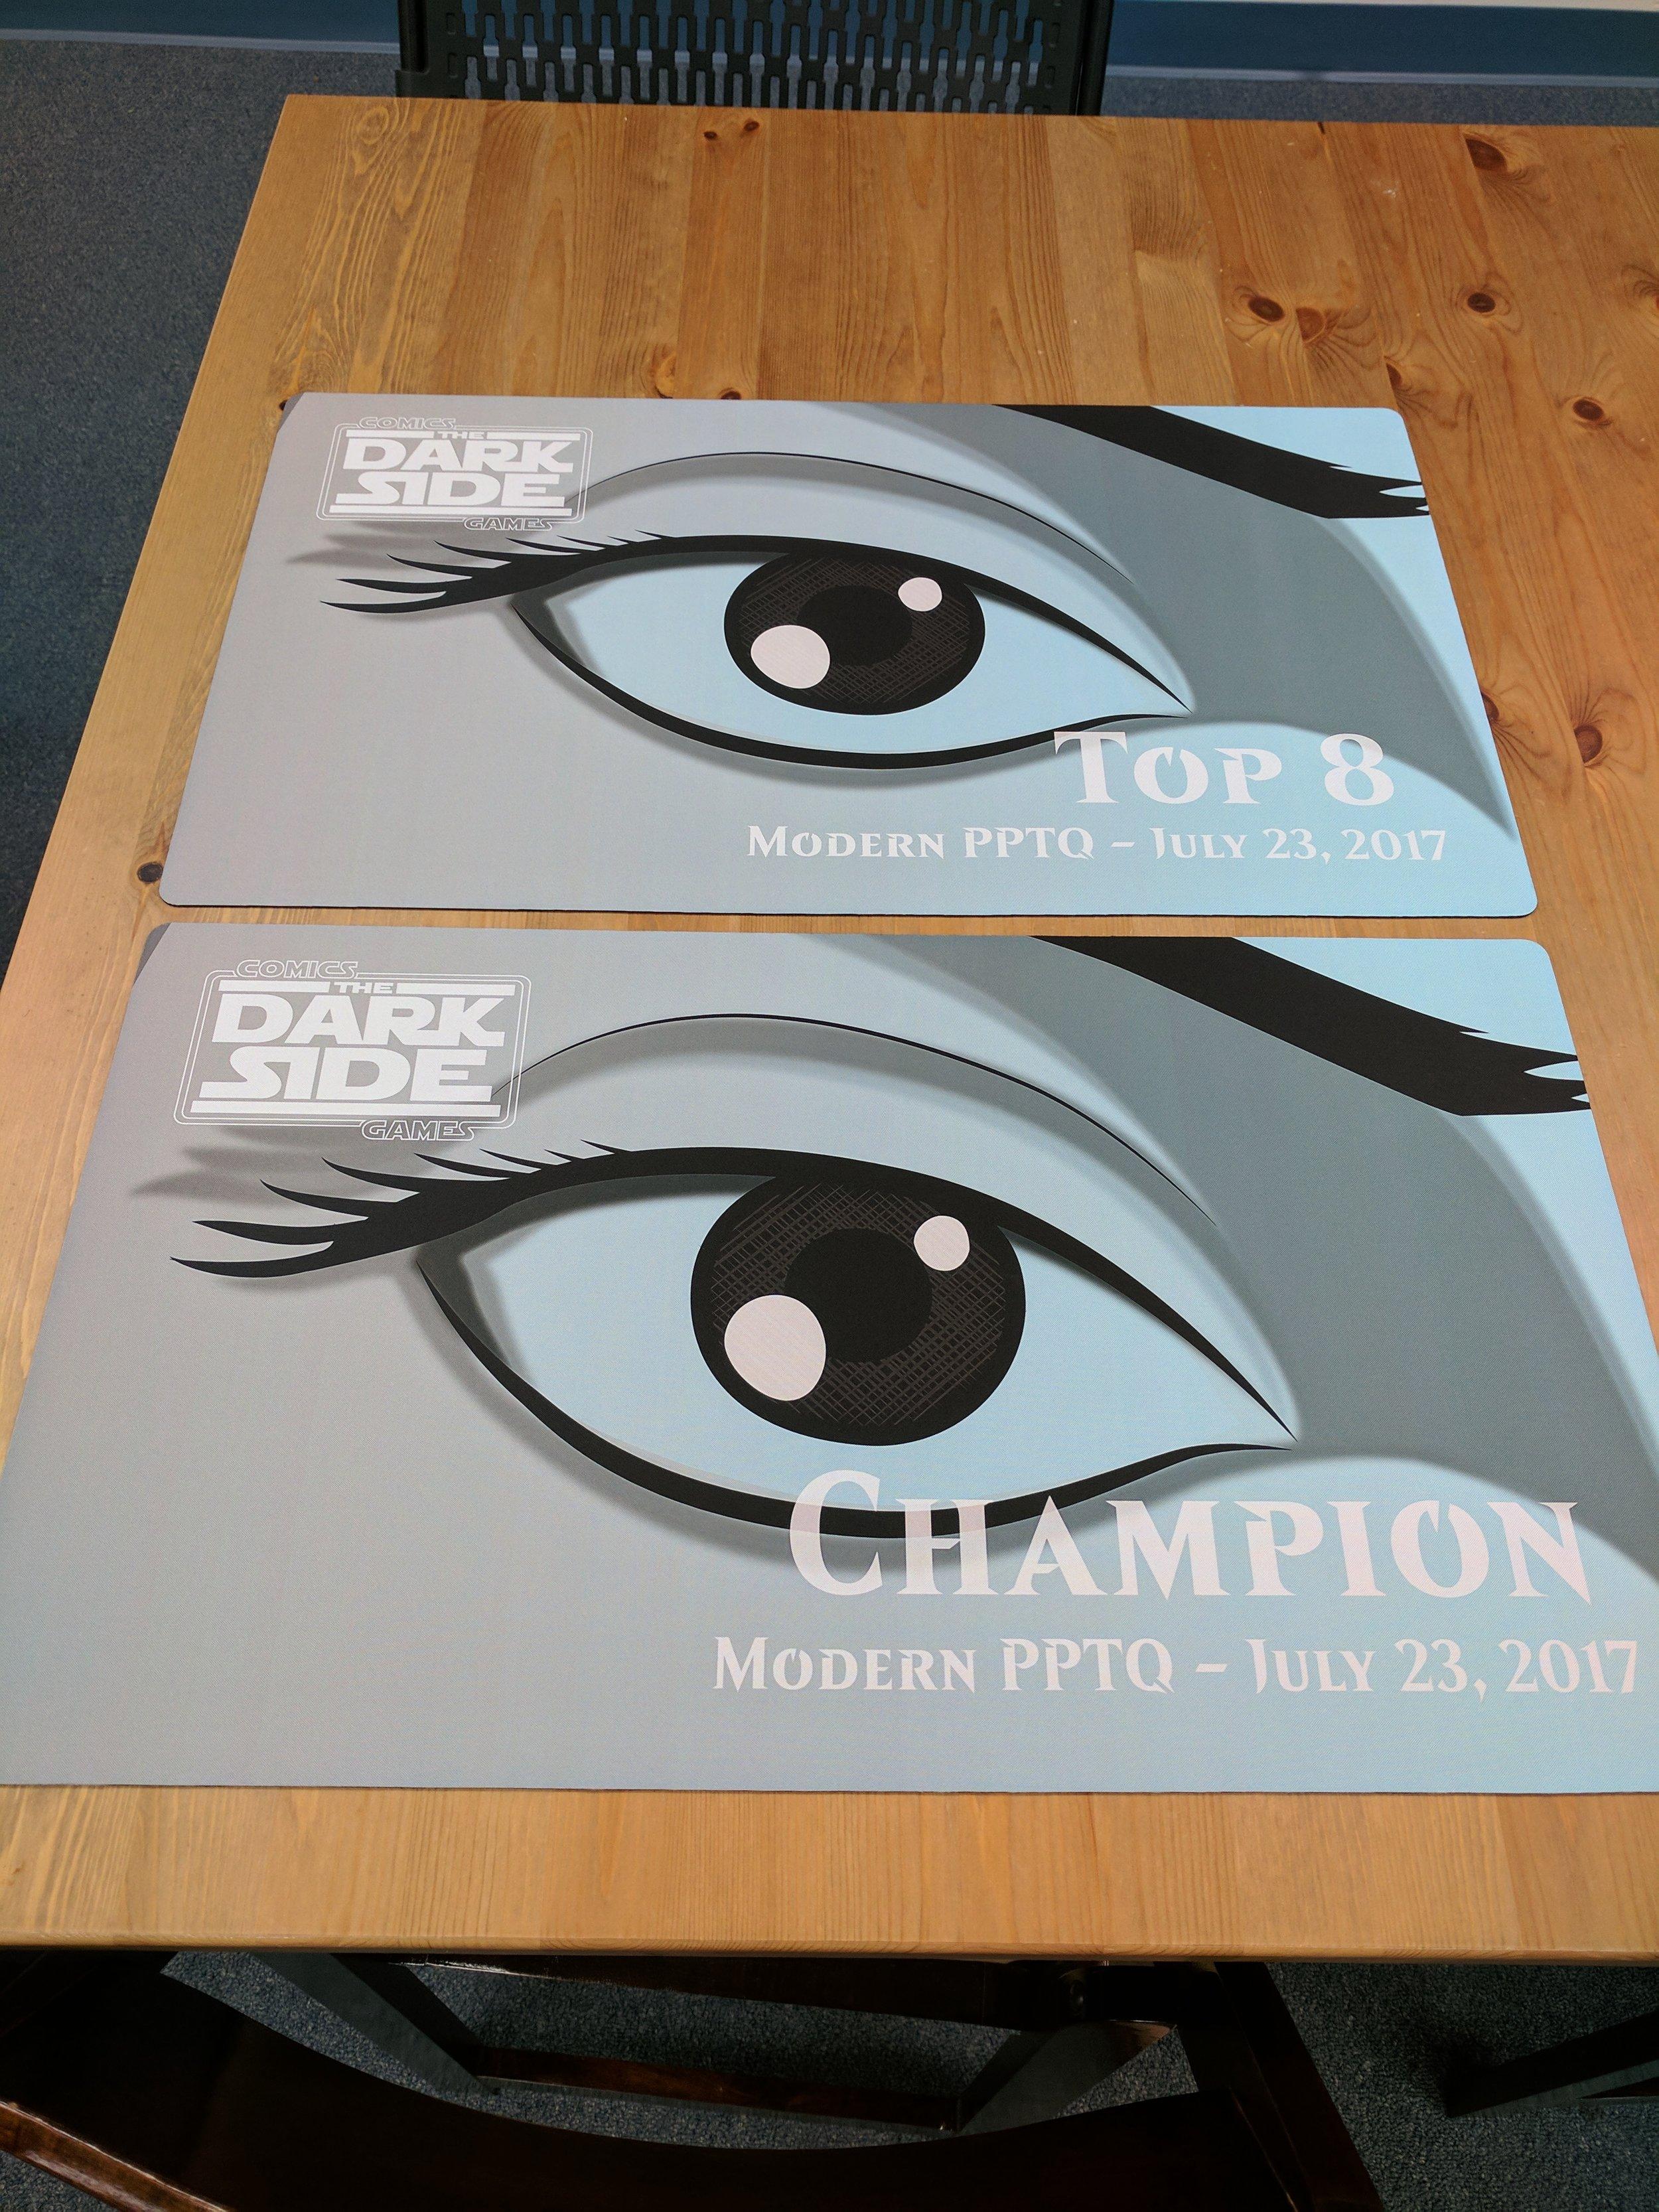 Champion & Top 8 playmats